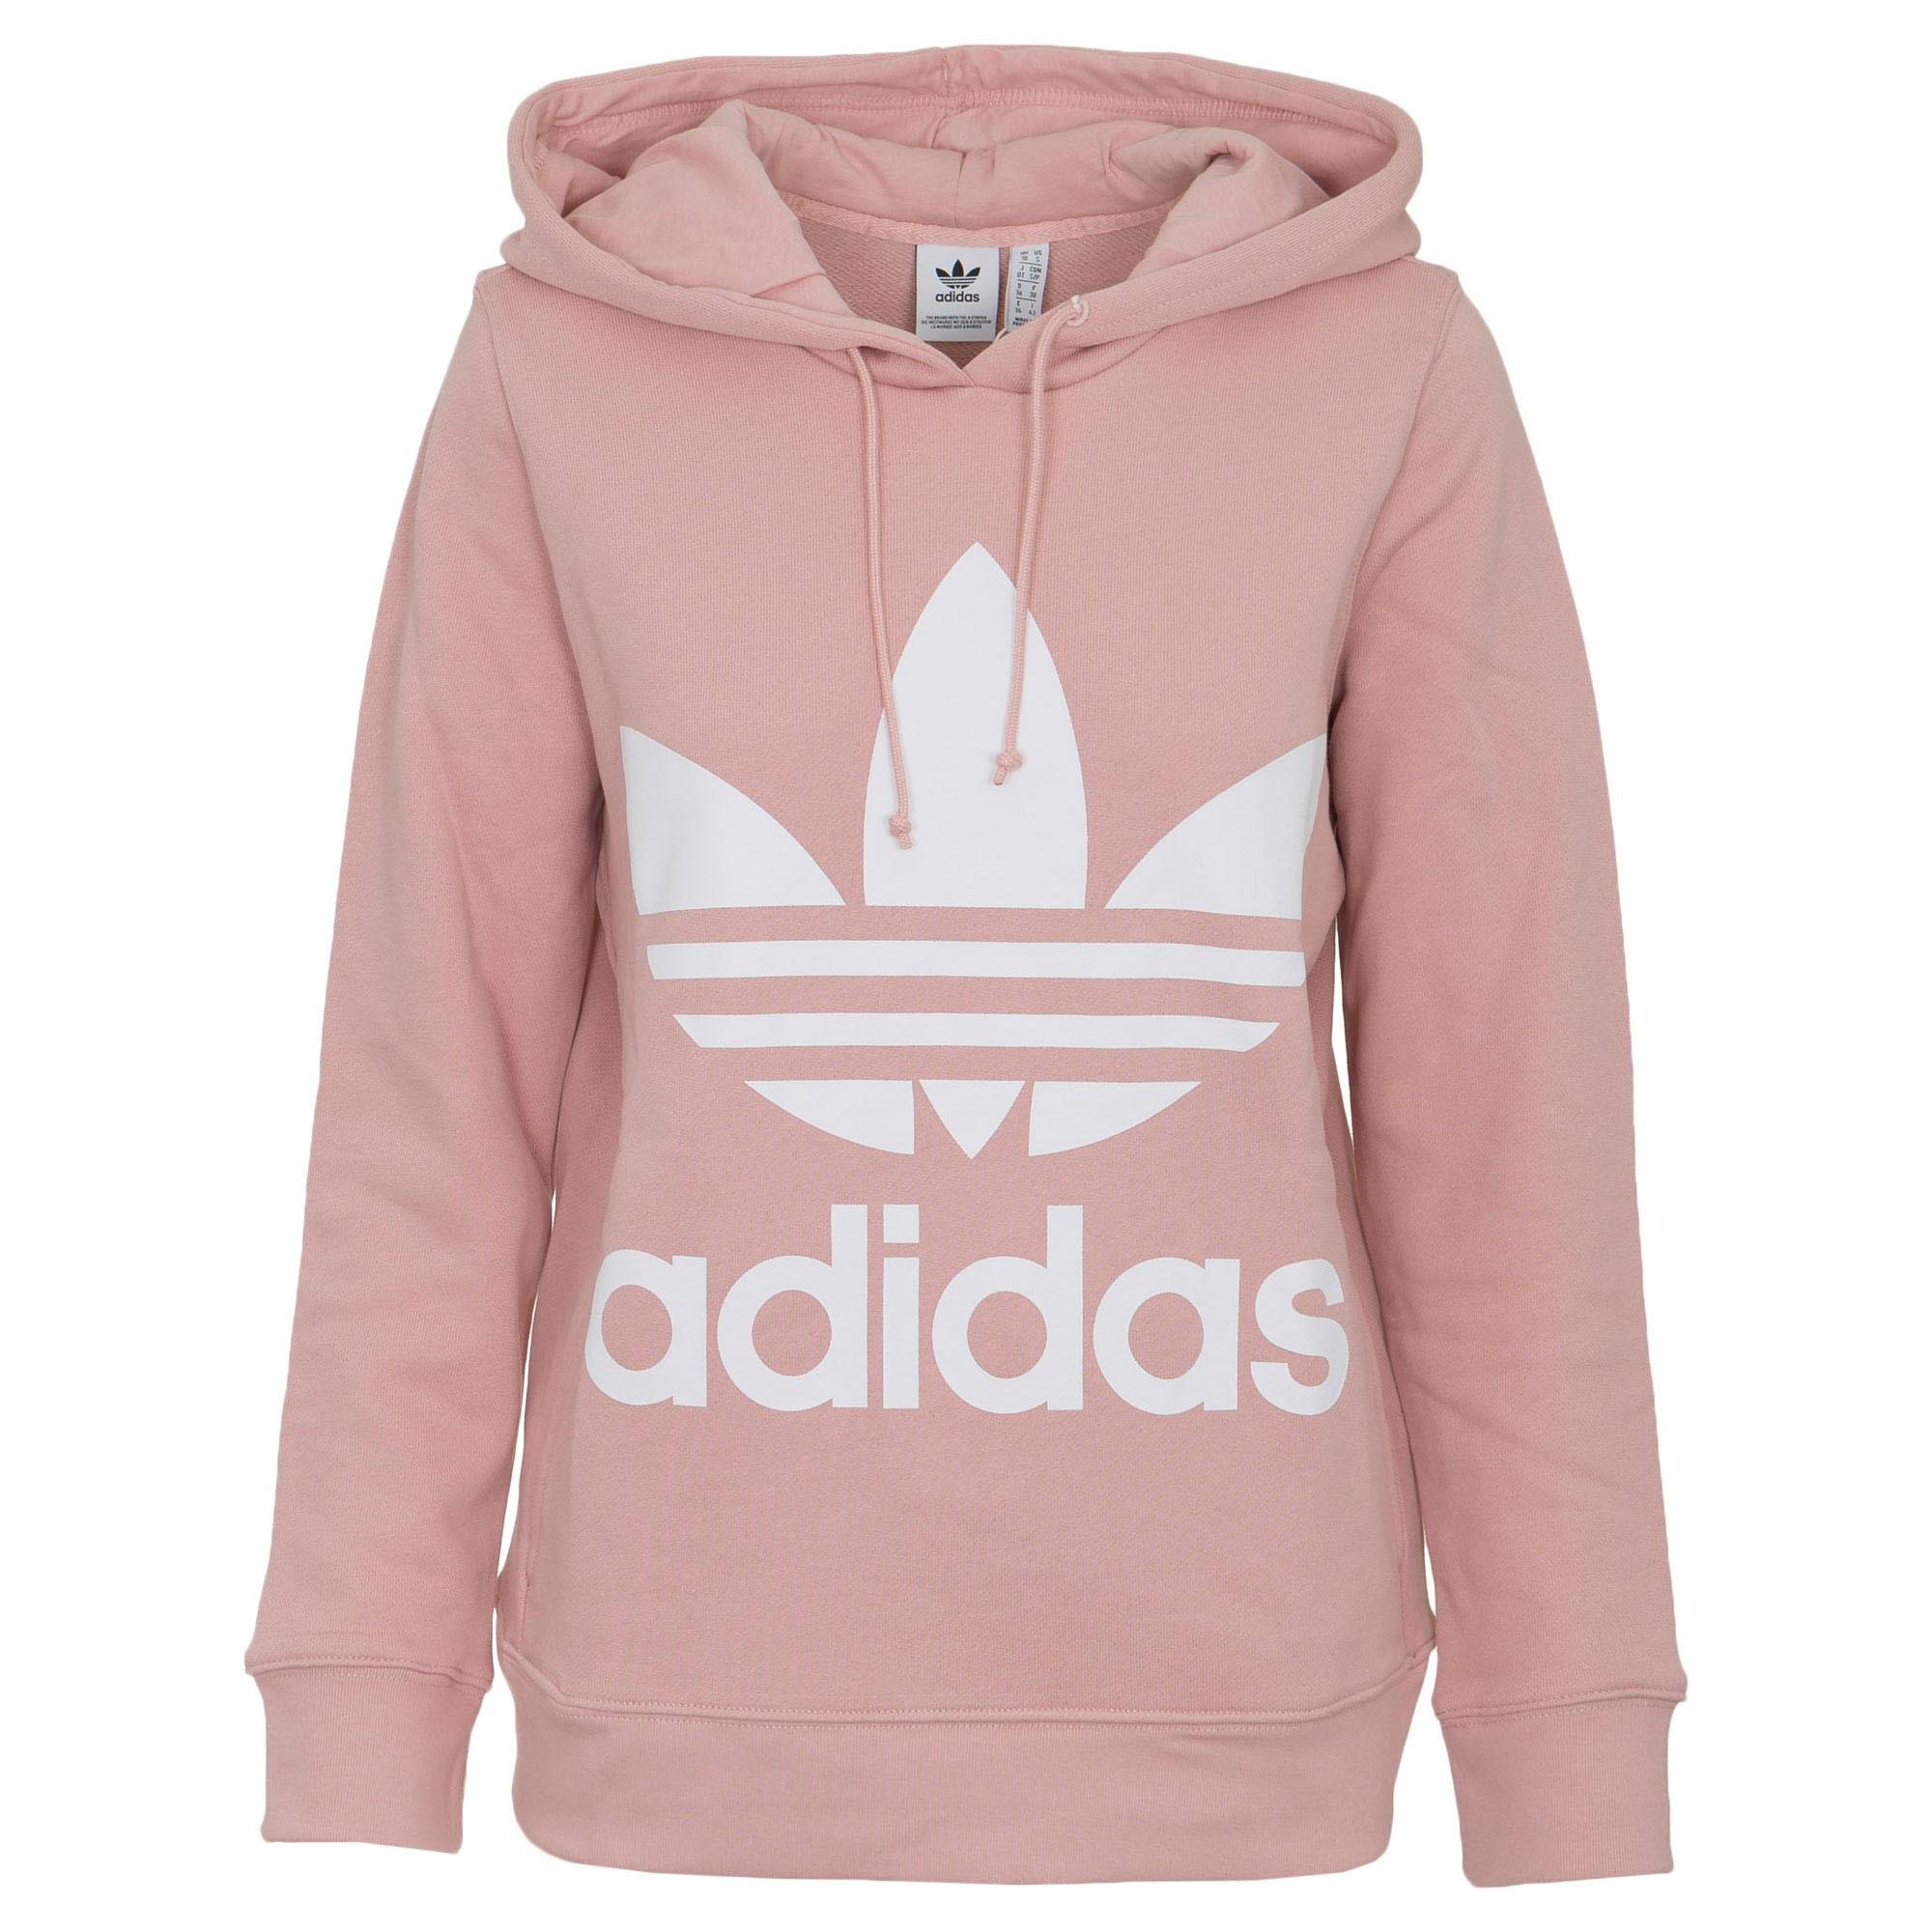 74de017a02 Adidas Originals Trefoil Hoodie Női Pulóver (Rózsaszín-Fehér) DH3134